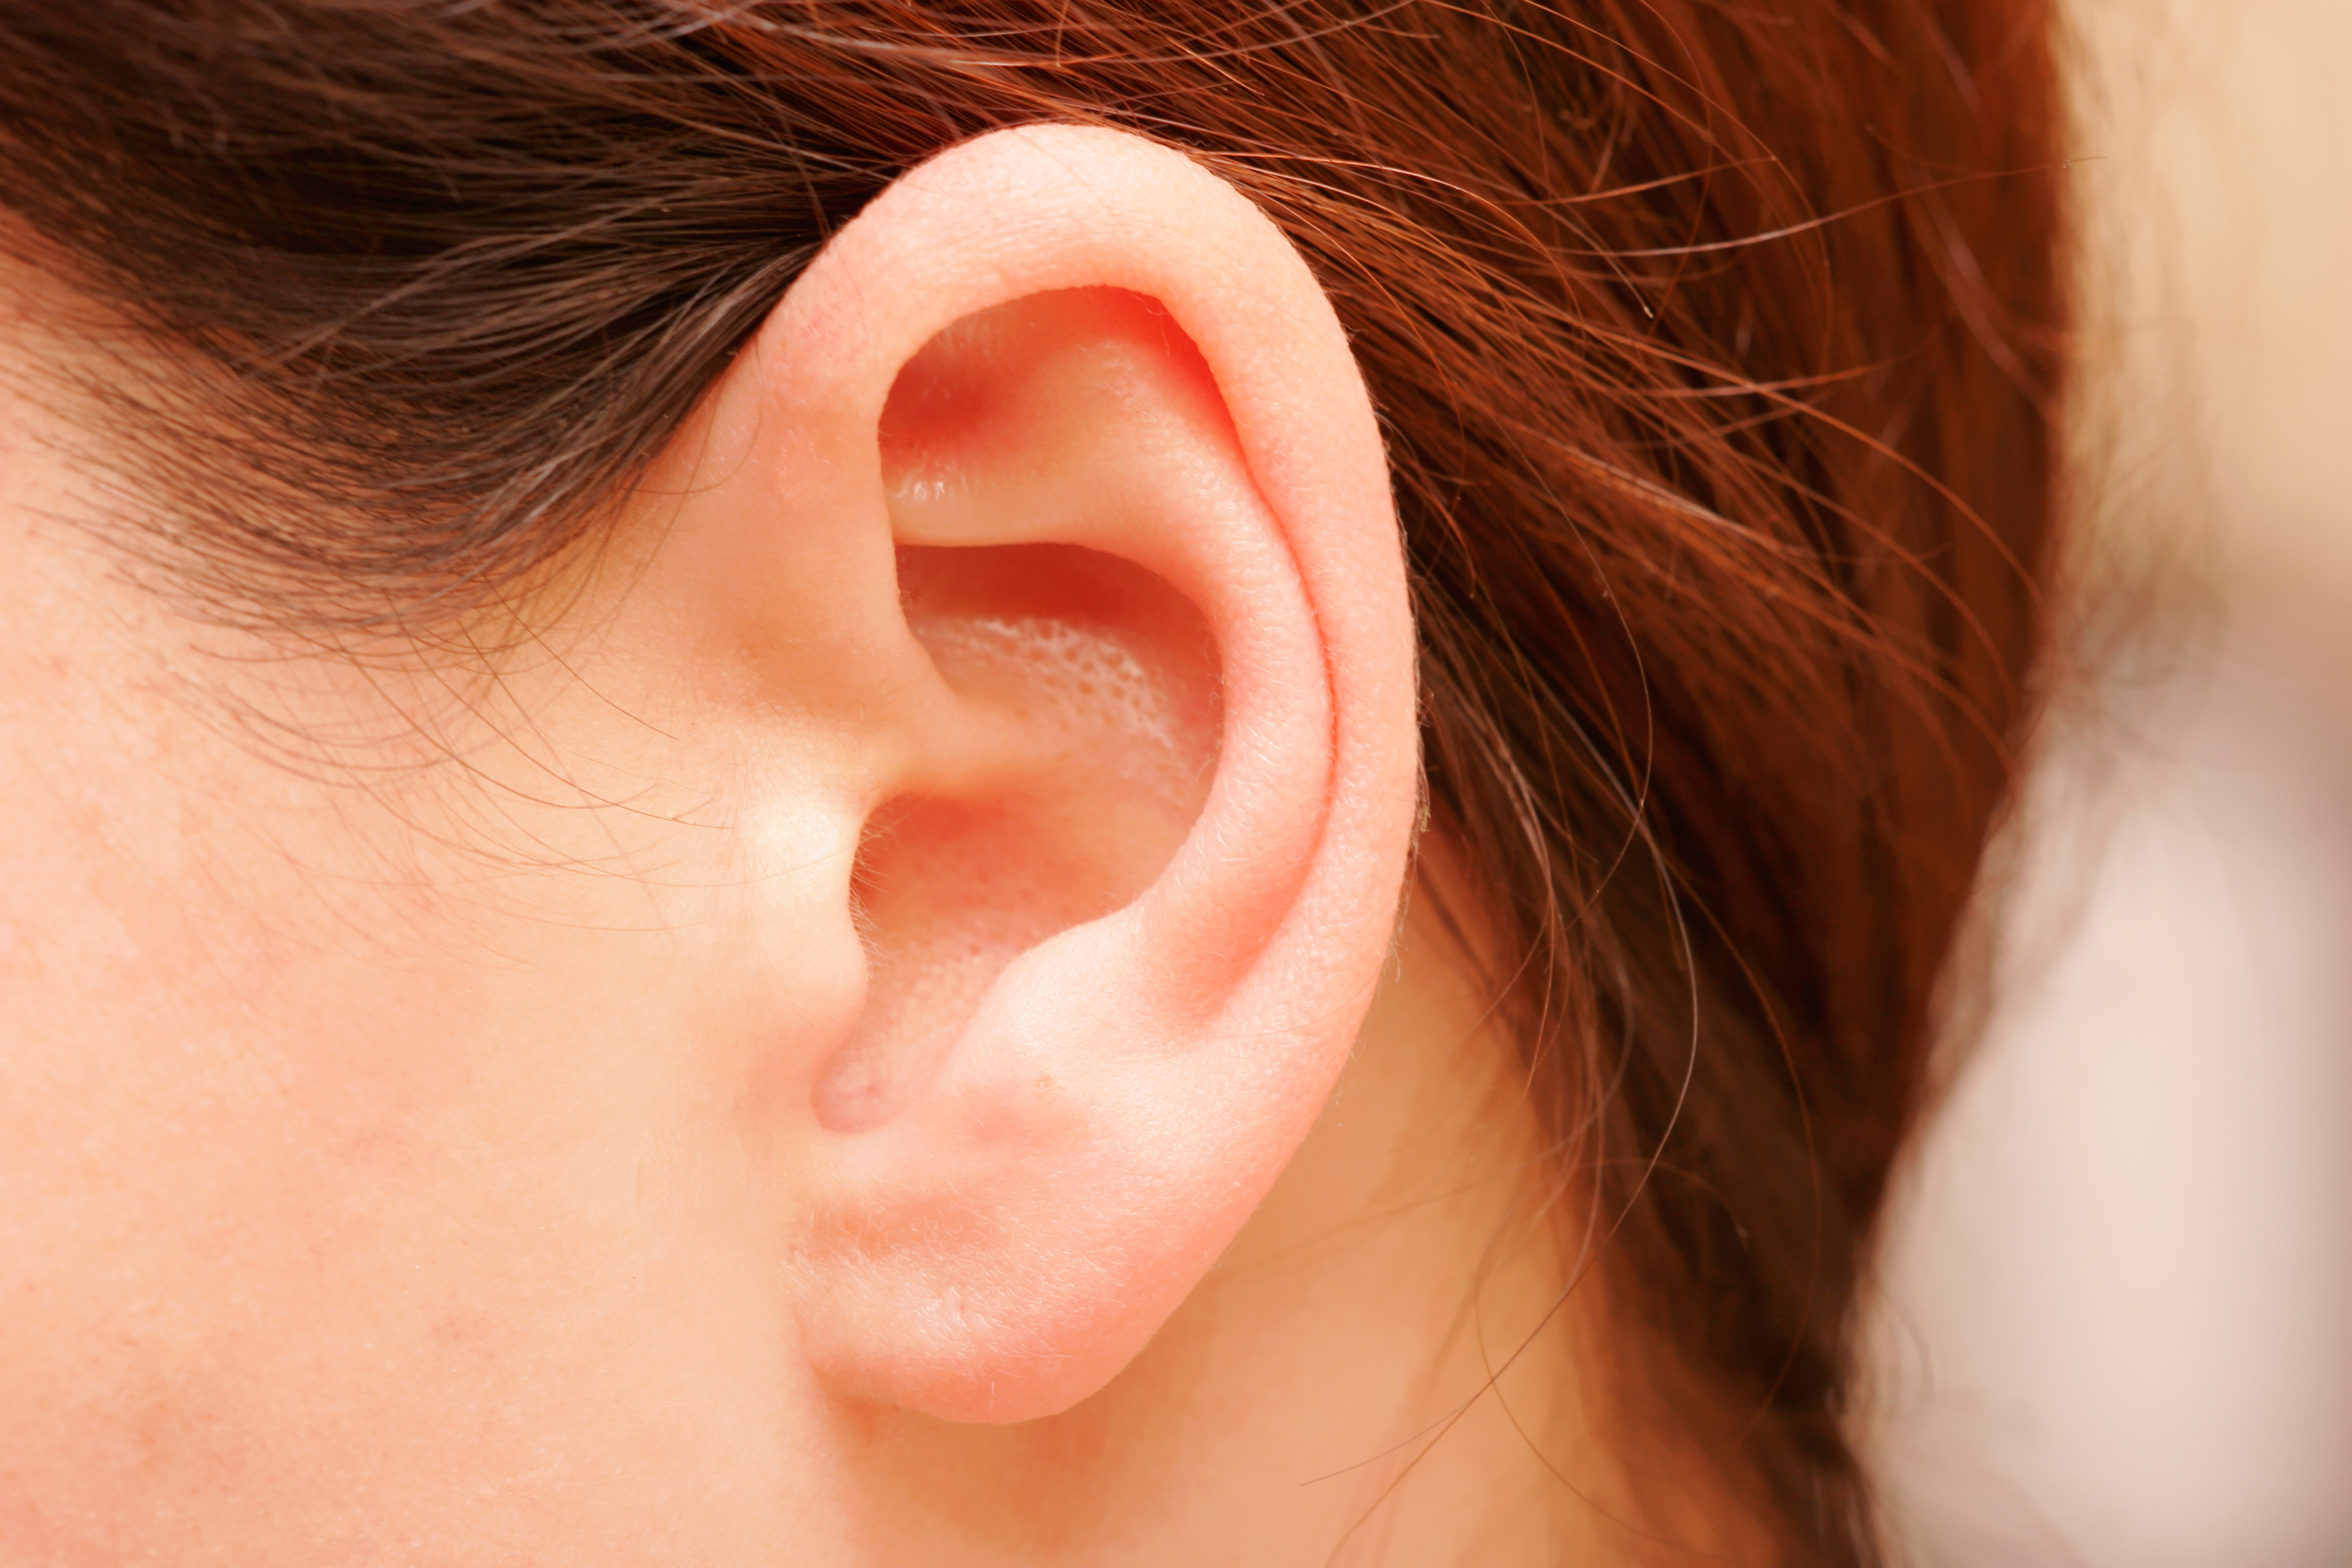 painless lump behind ear